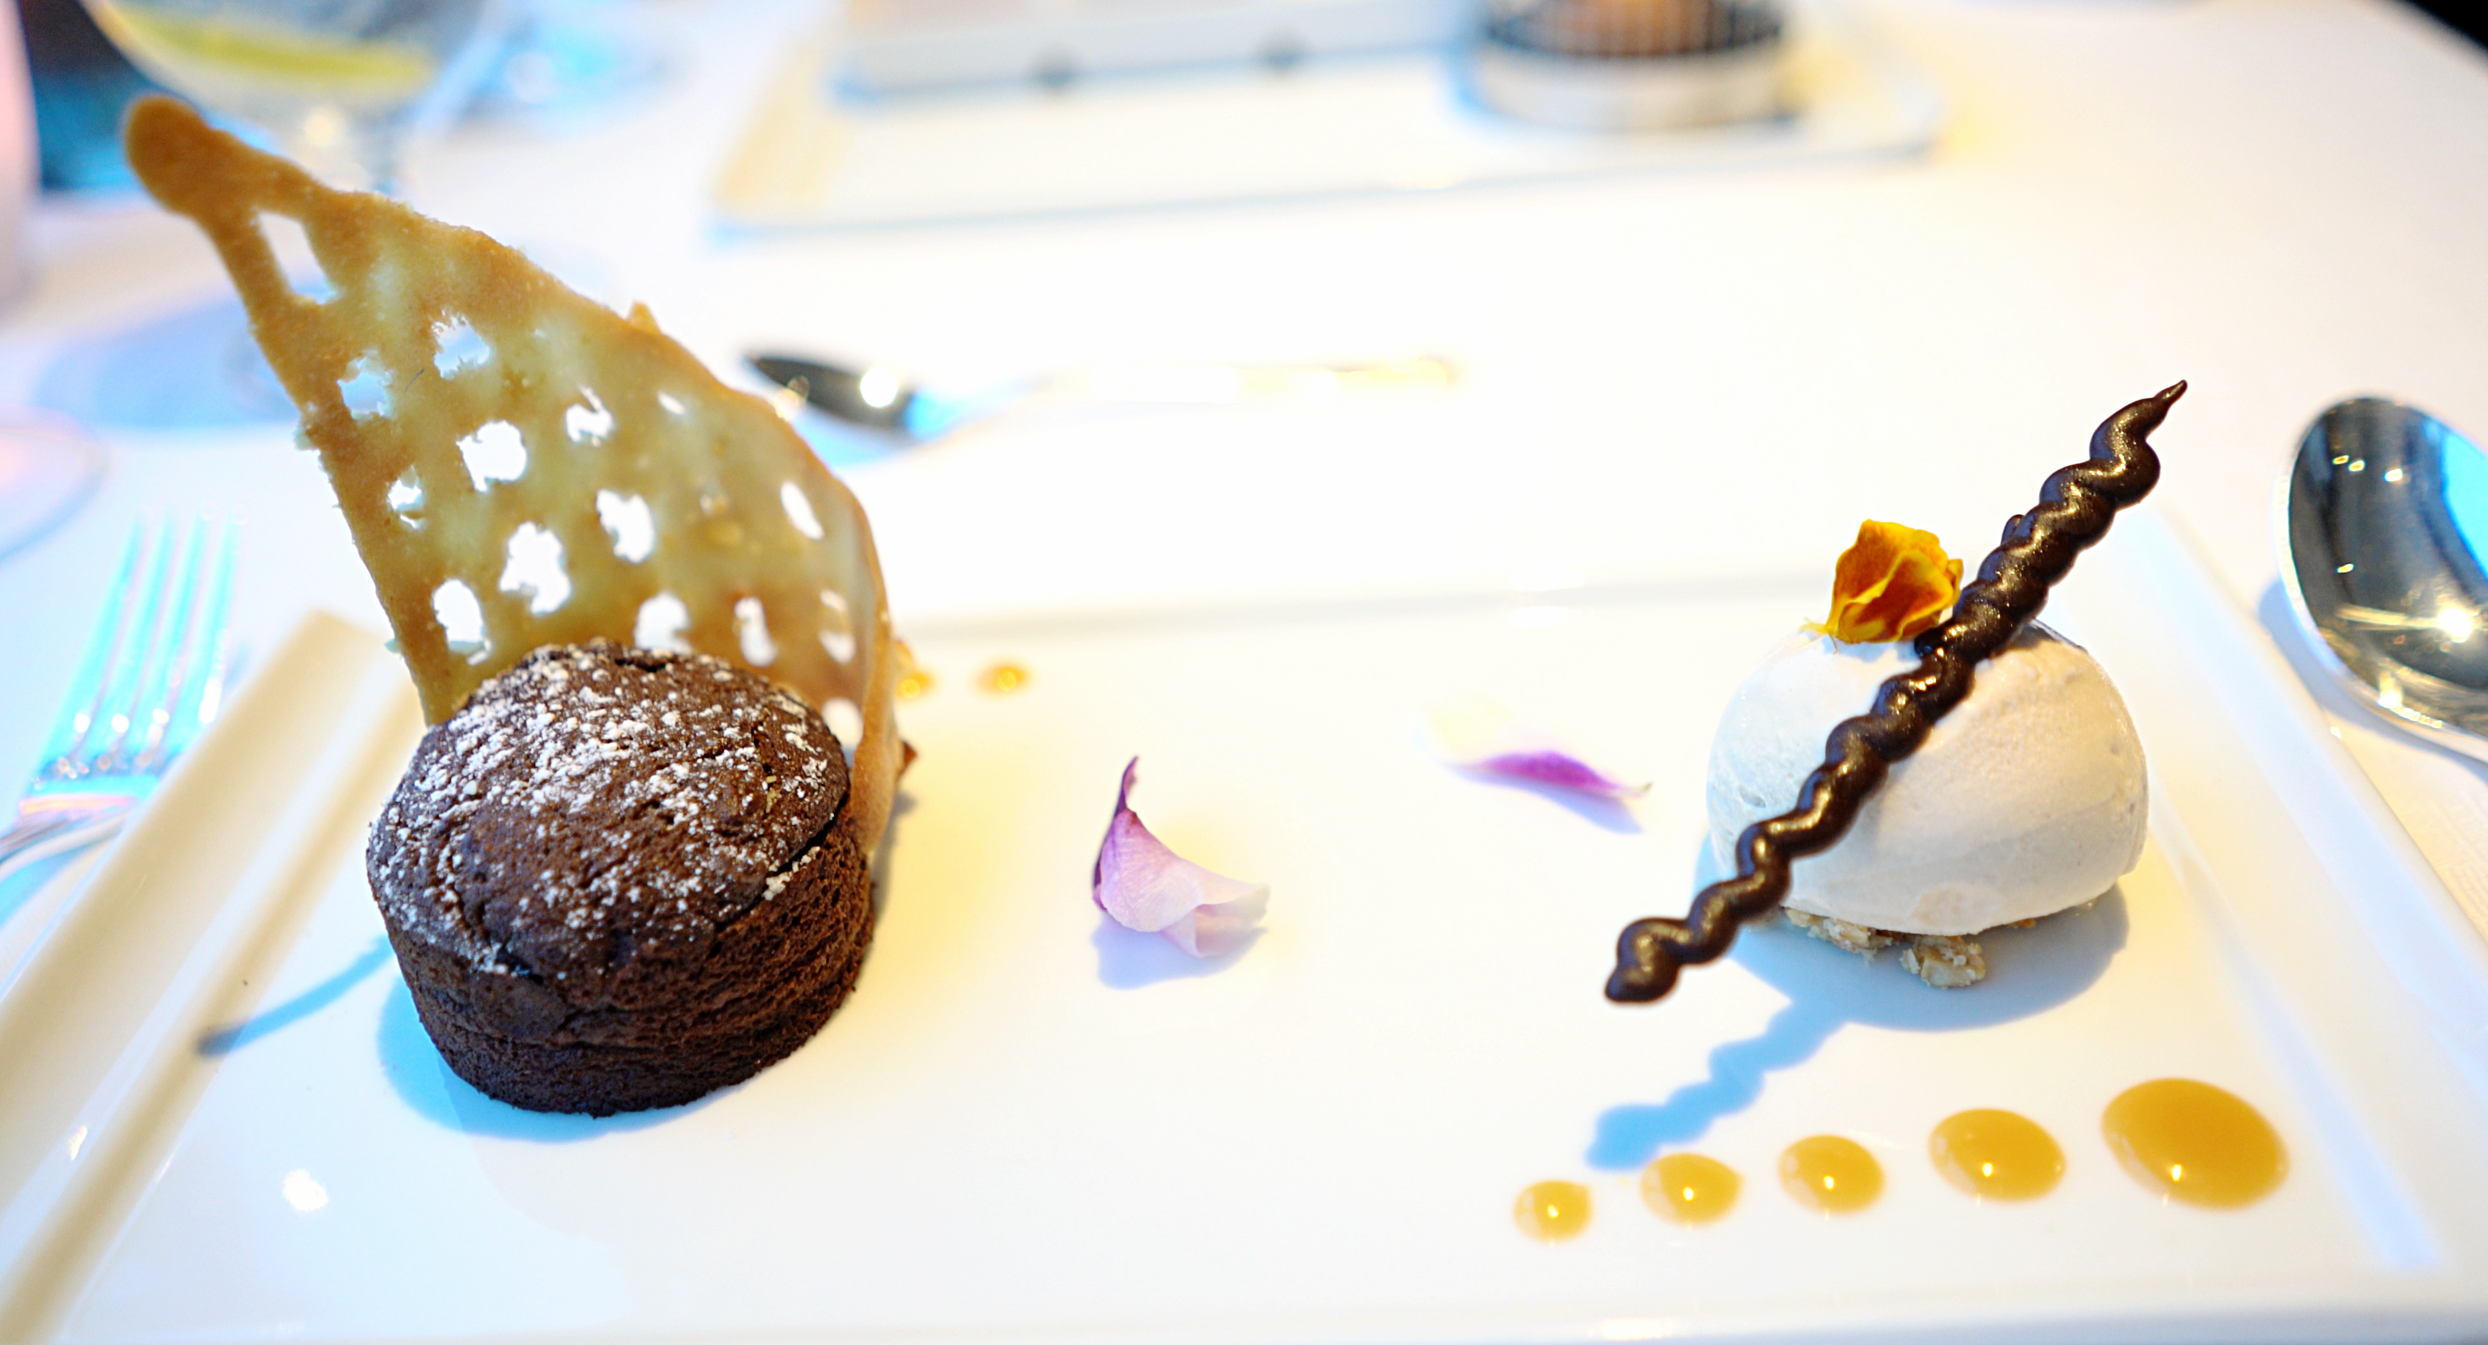 The chocolate fondant in Prime C.